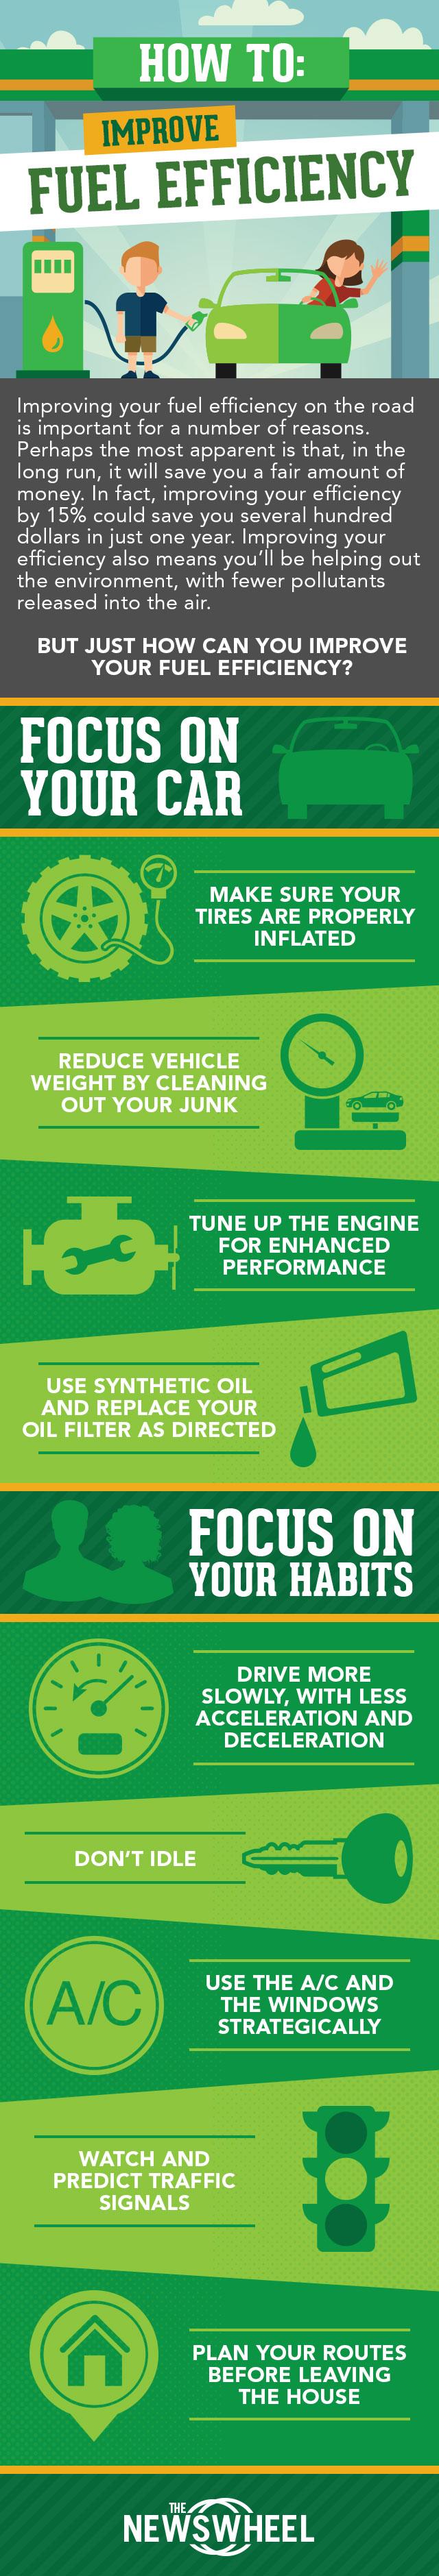 FuelEfficiencyInfographic-2.jpg